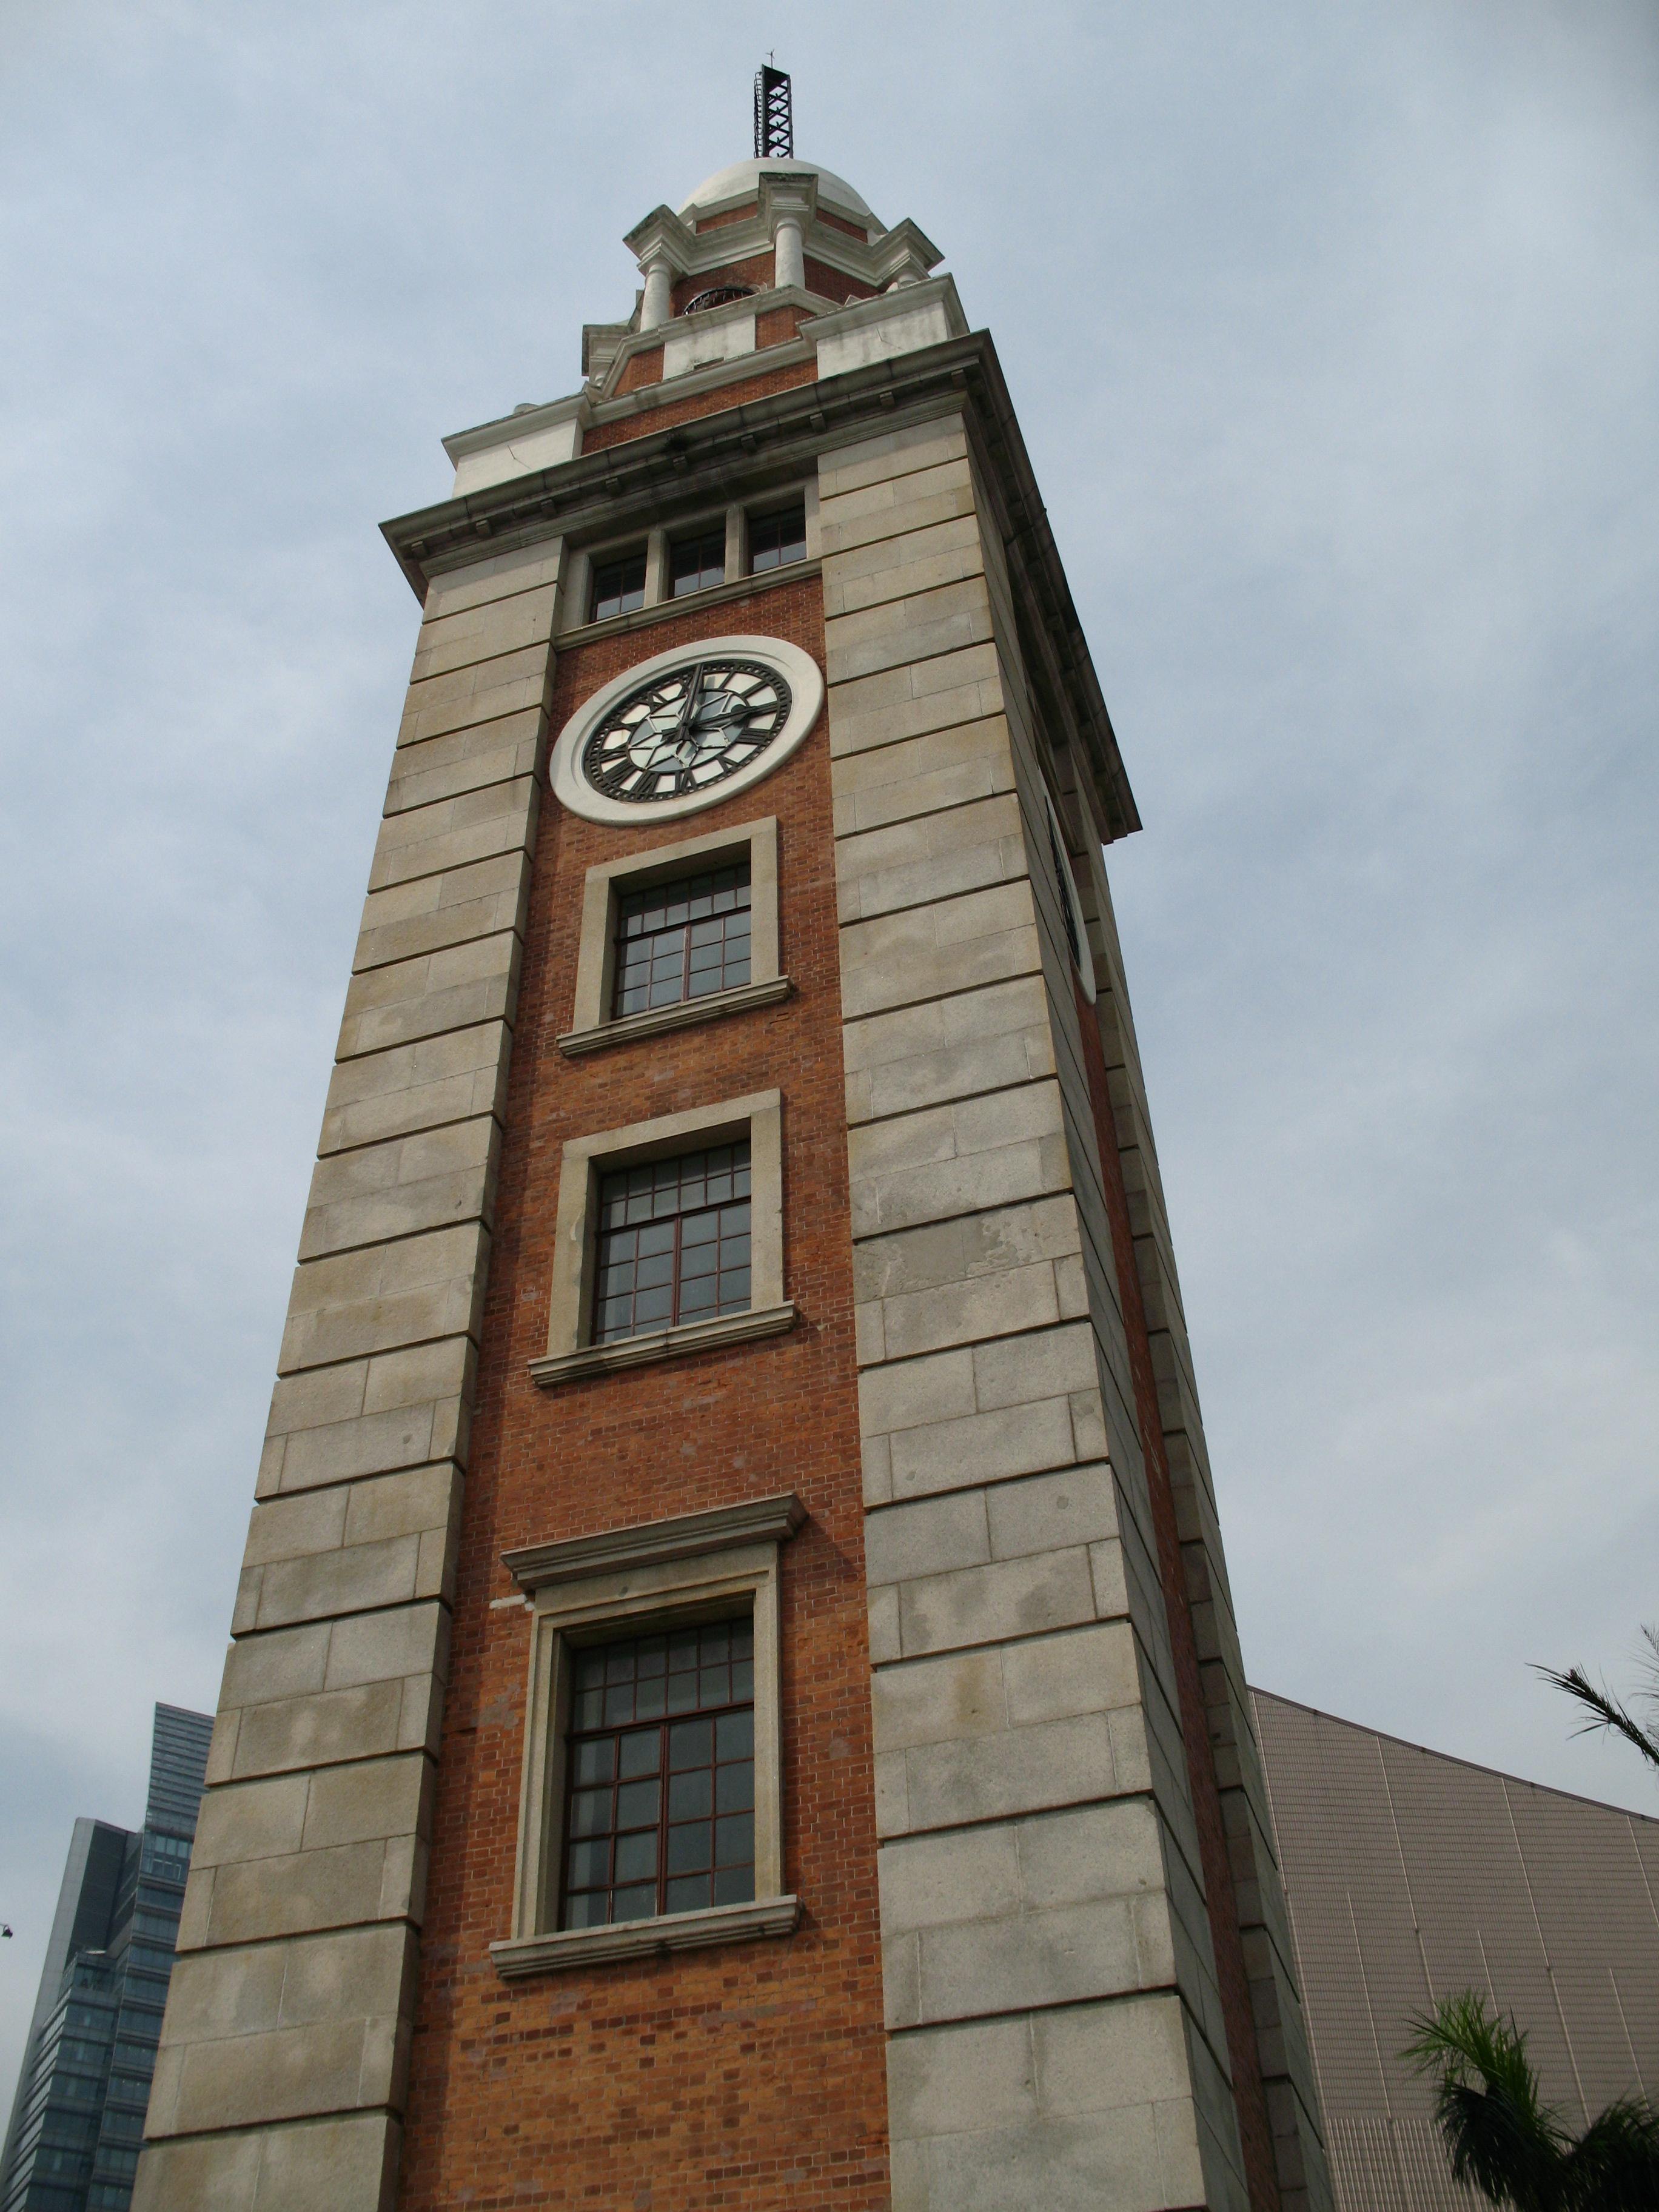 File:The Clock Tower in Tsim Sha Tsui.JPG